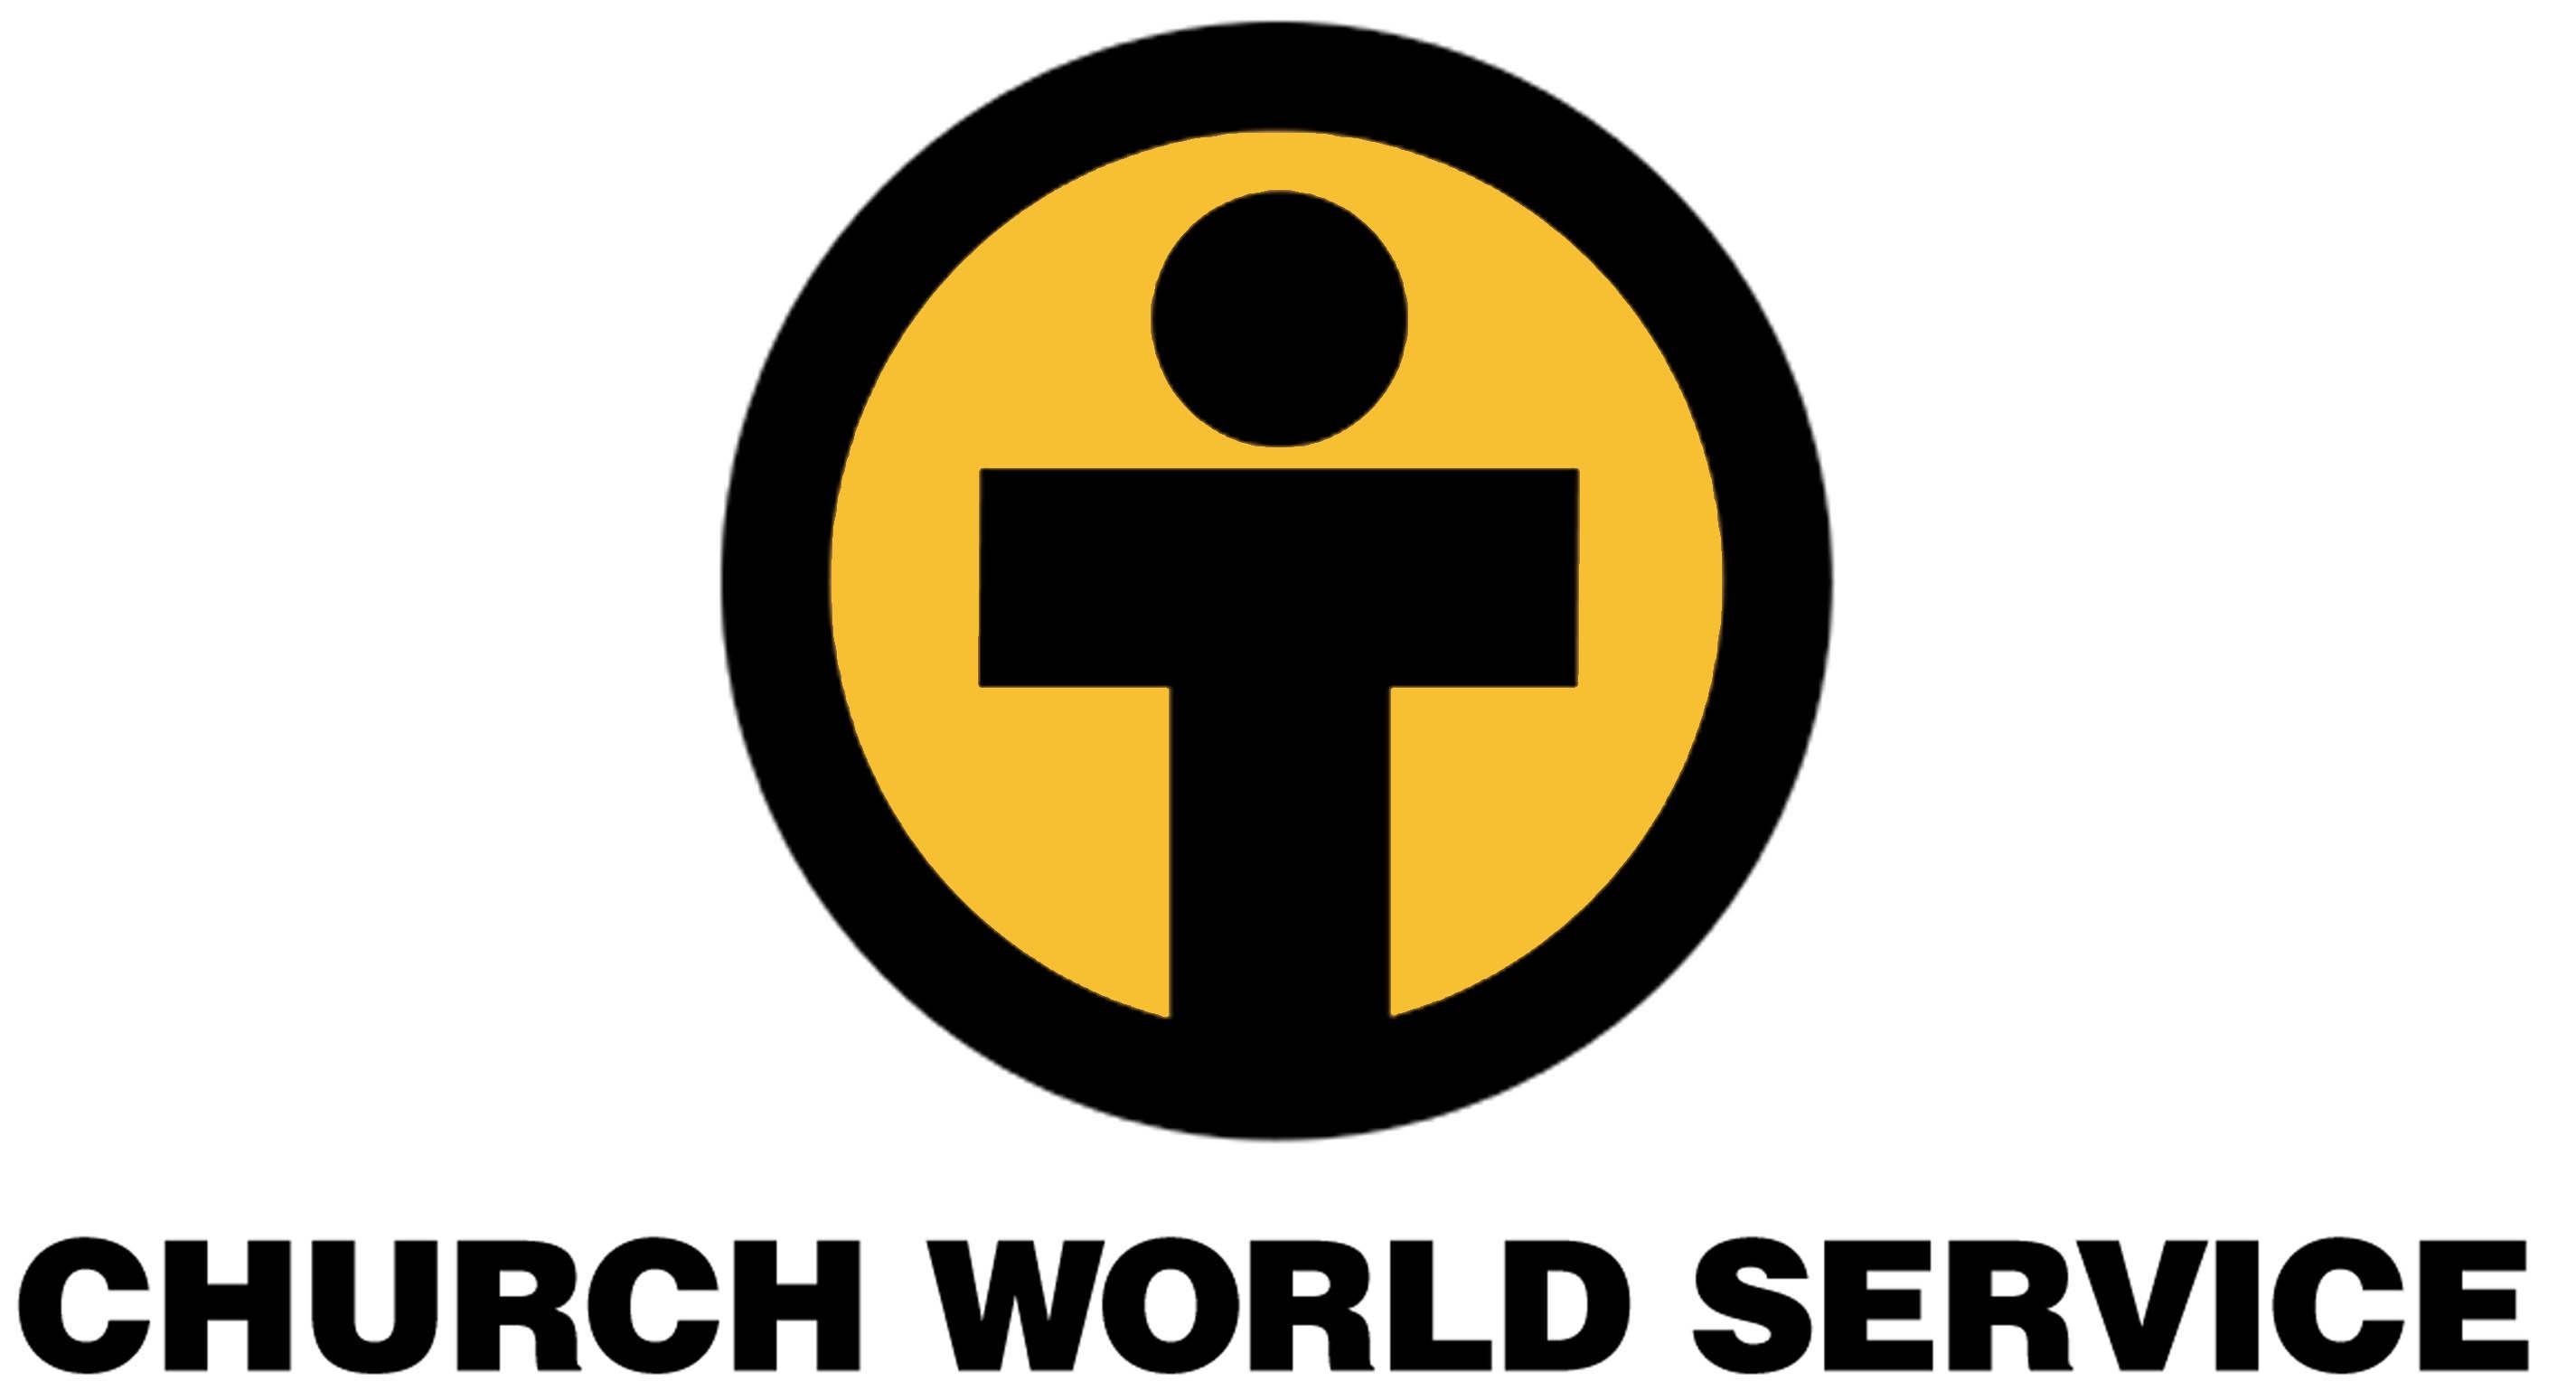 churchworldservice.jpg